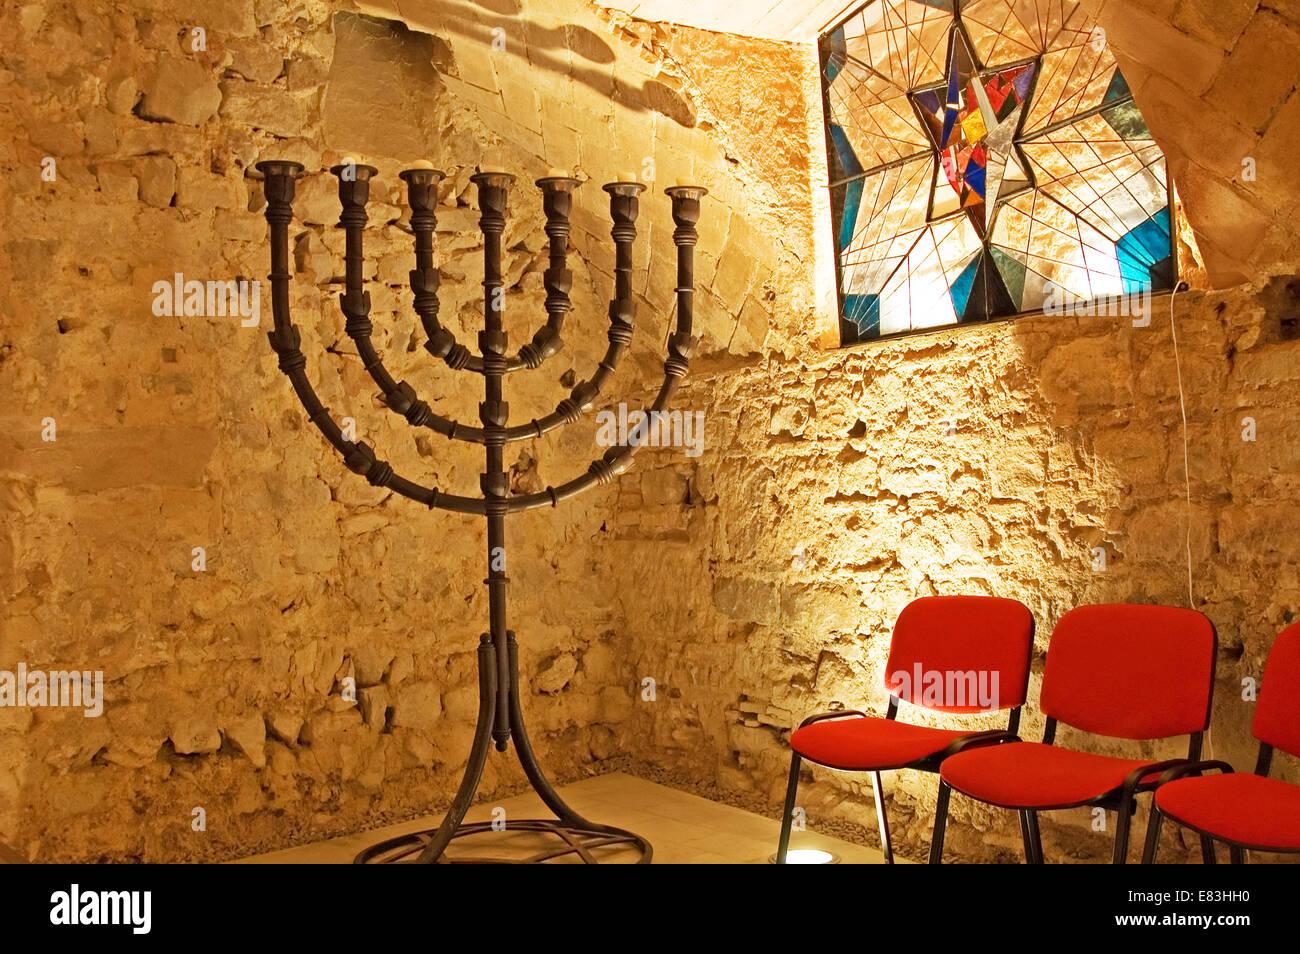 Barcelona old Synagogue - Stock Image